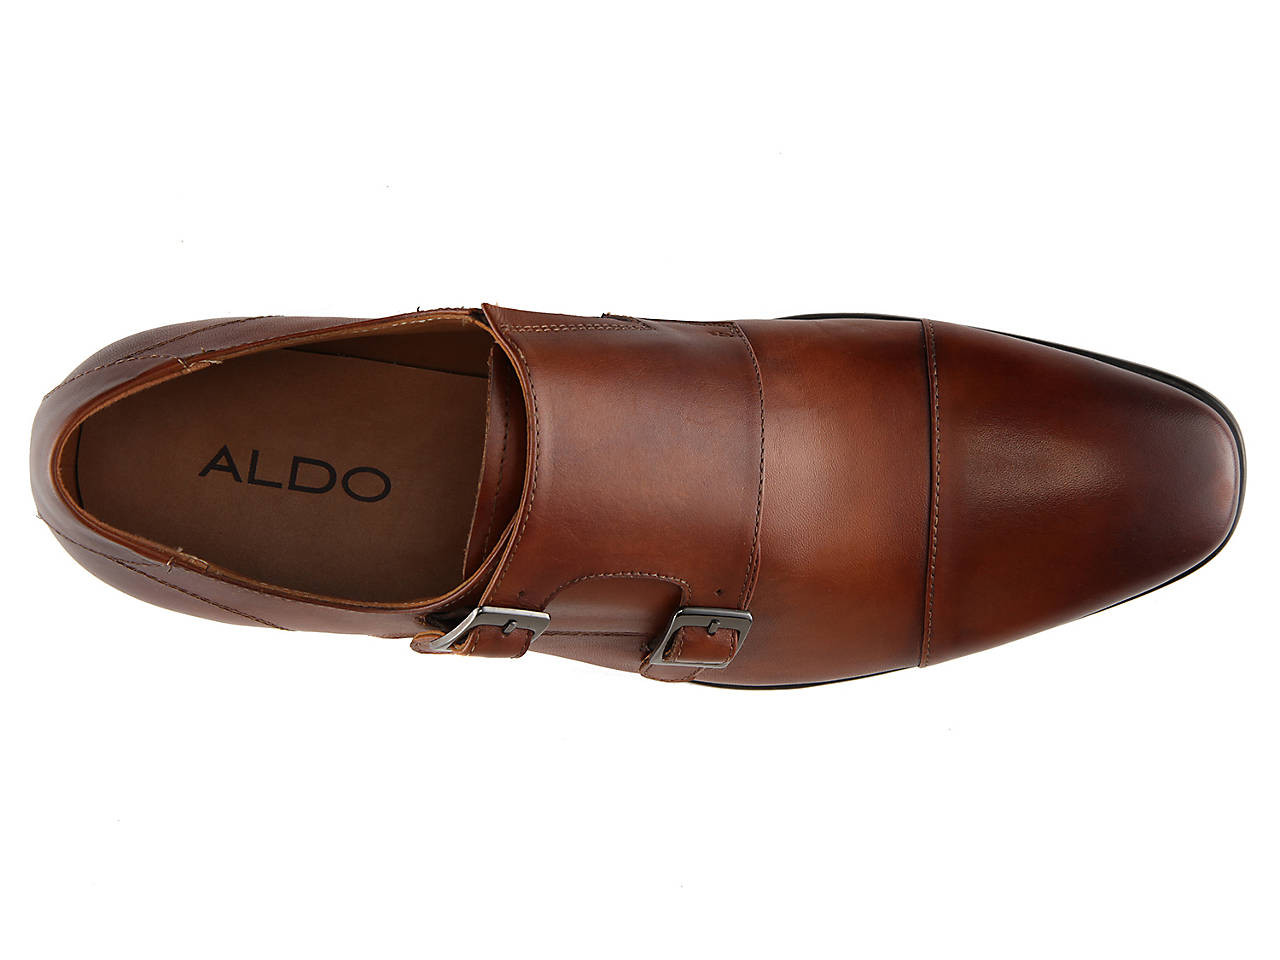 Aldo Mens Shoes Reviews Style Guru Fashion Glitz